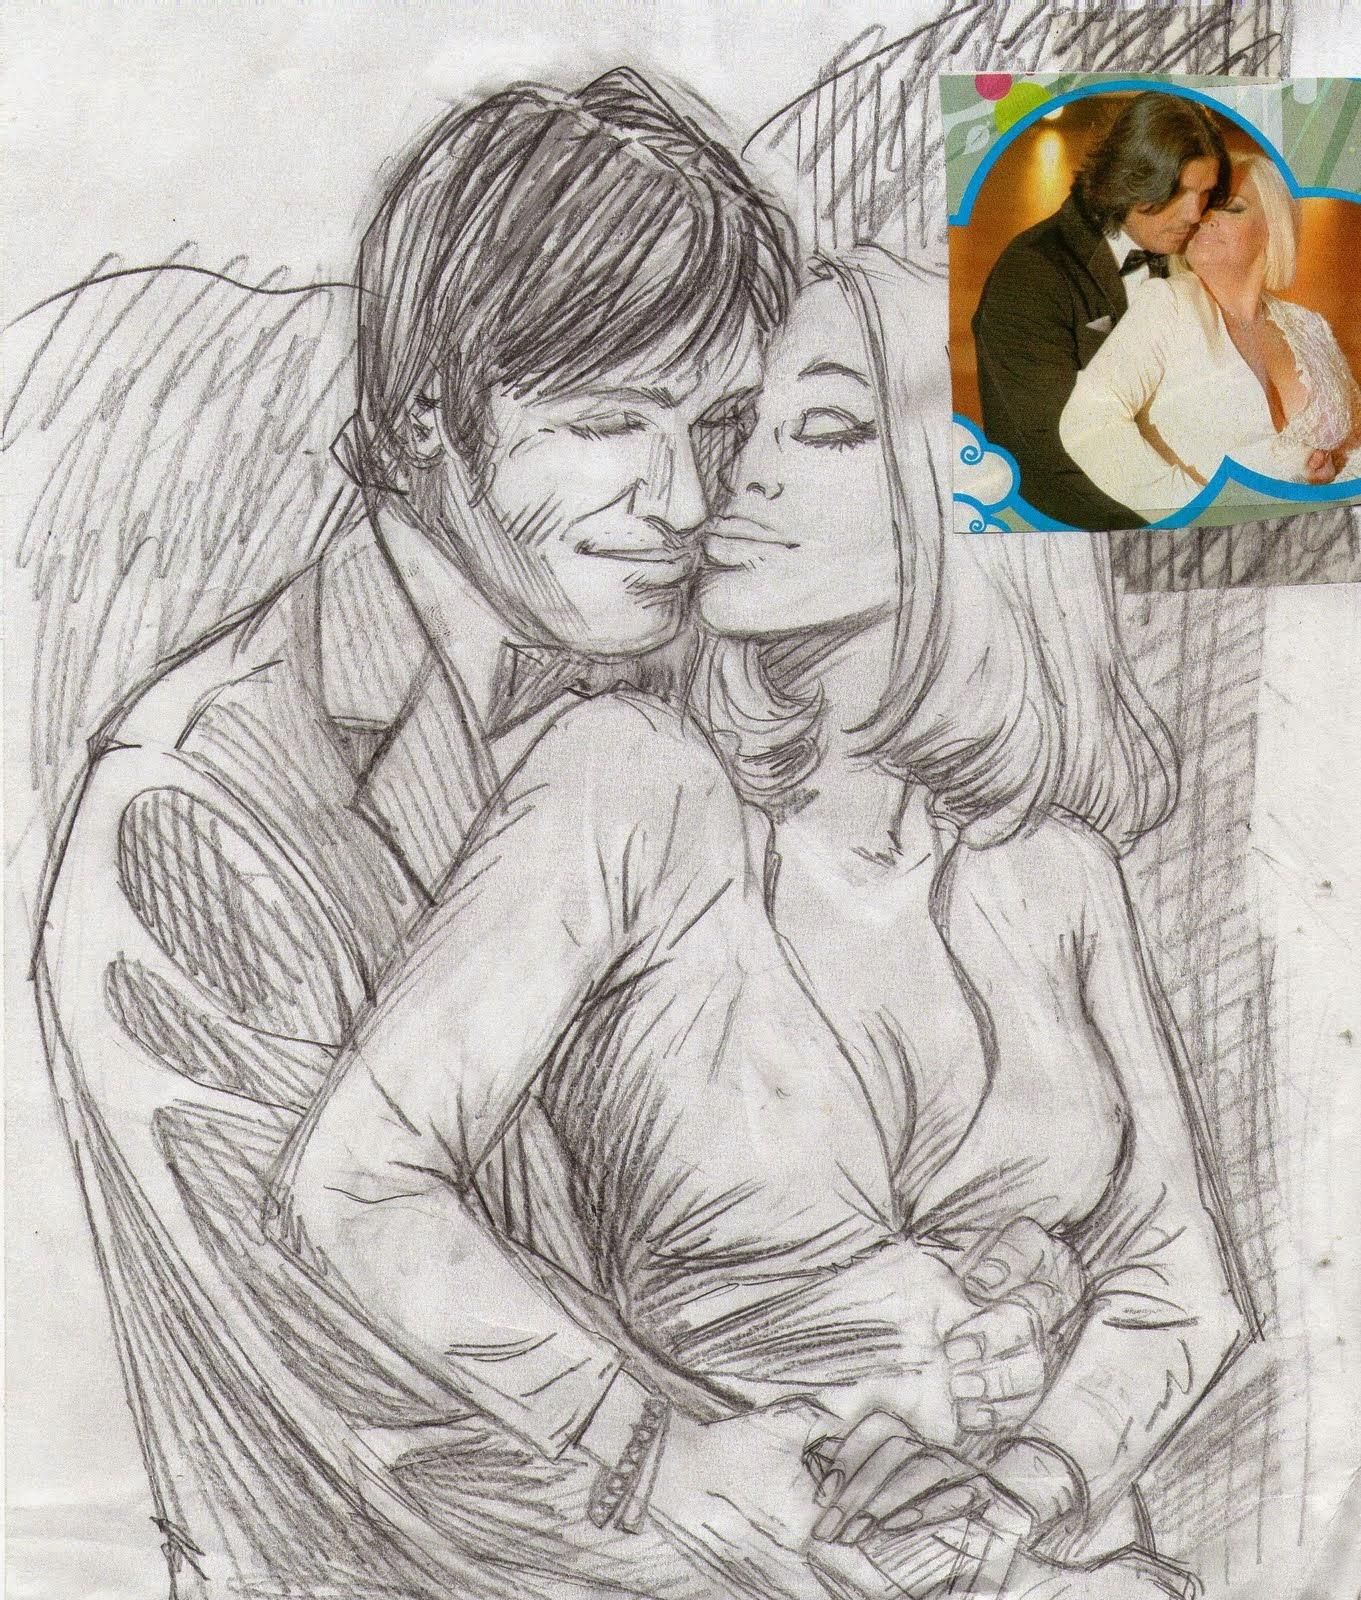 Dibujos Romanticos A Lapiz Imagenes De Amor Bonitas